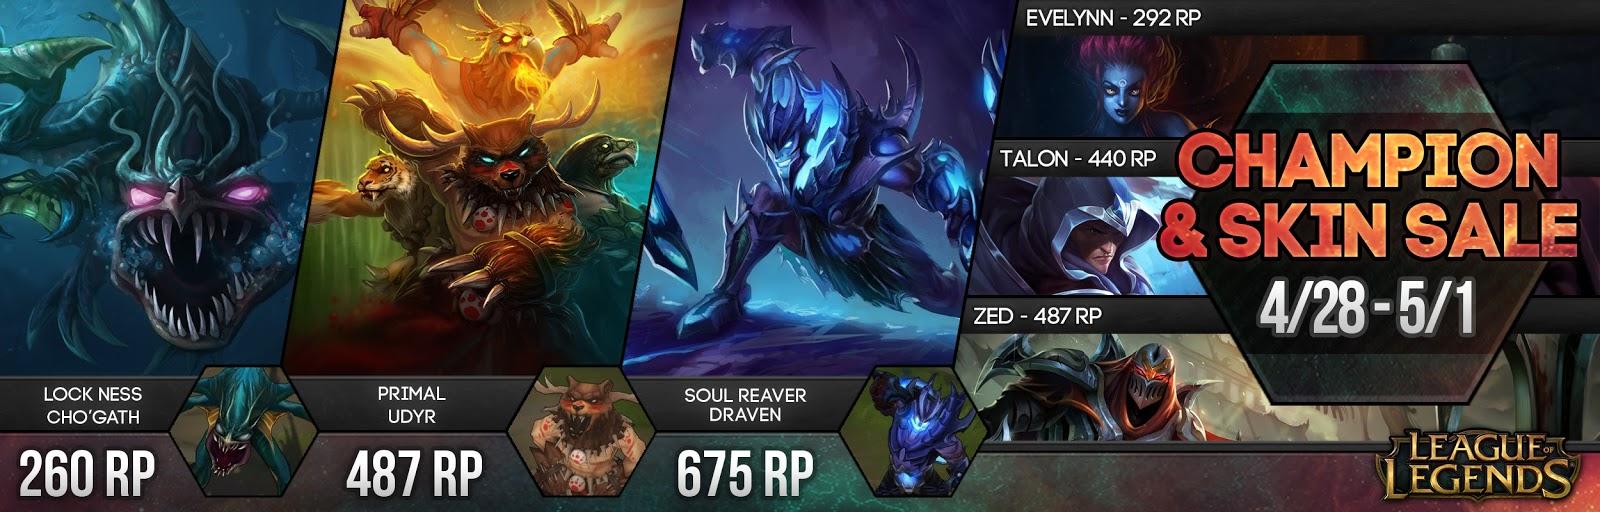 Soul Reaver Draven Skin Spotlight